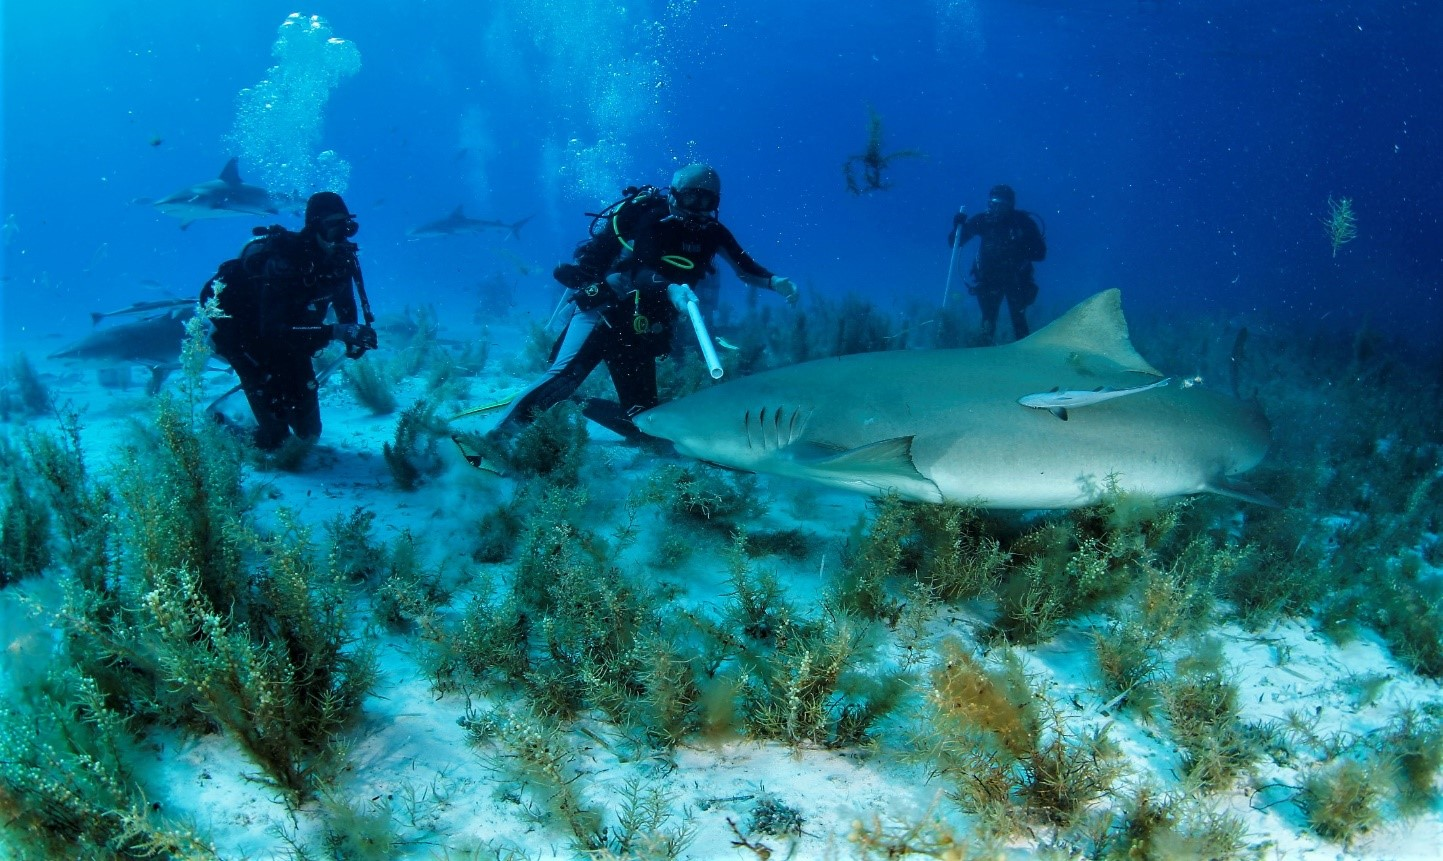 żółte rekiny atakują nurka